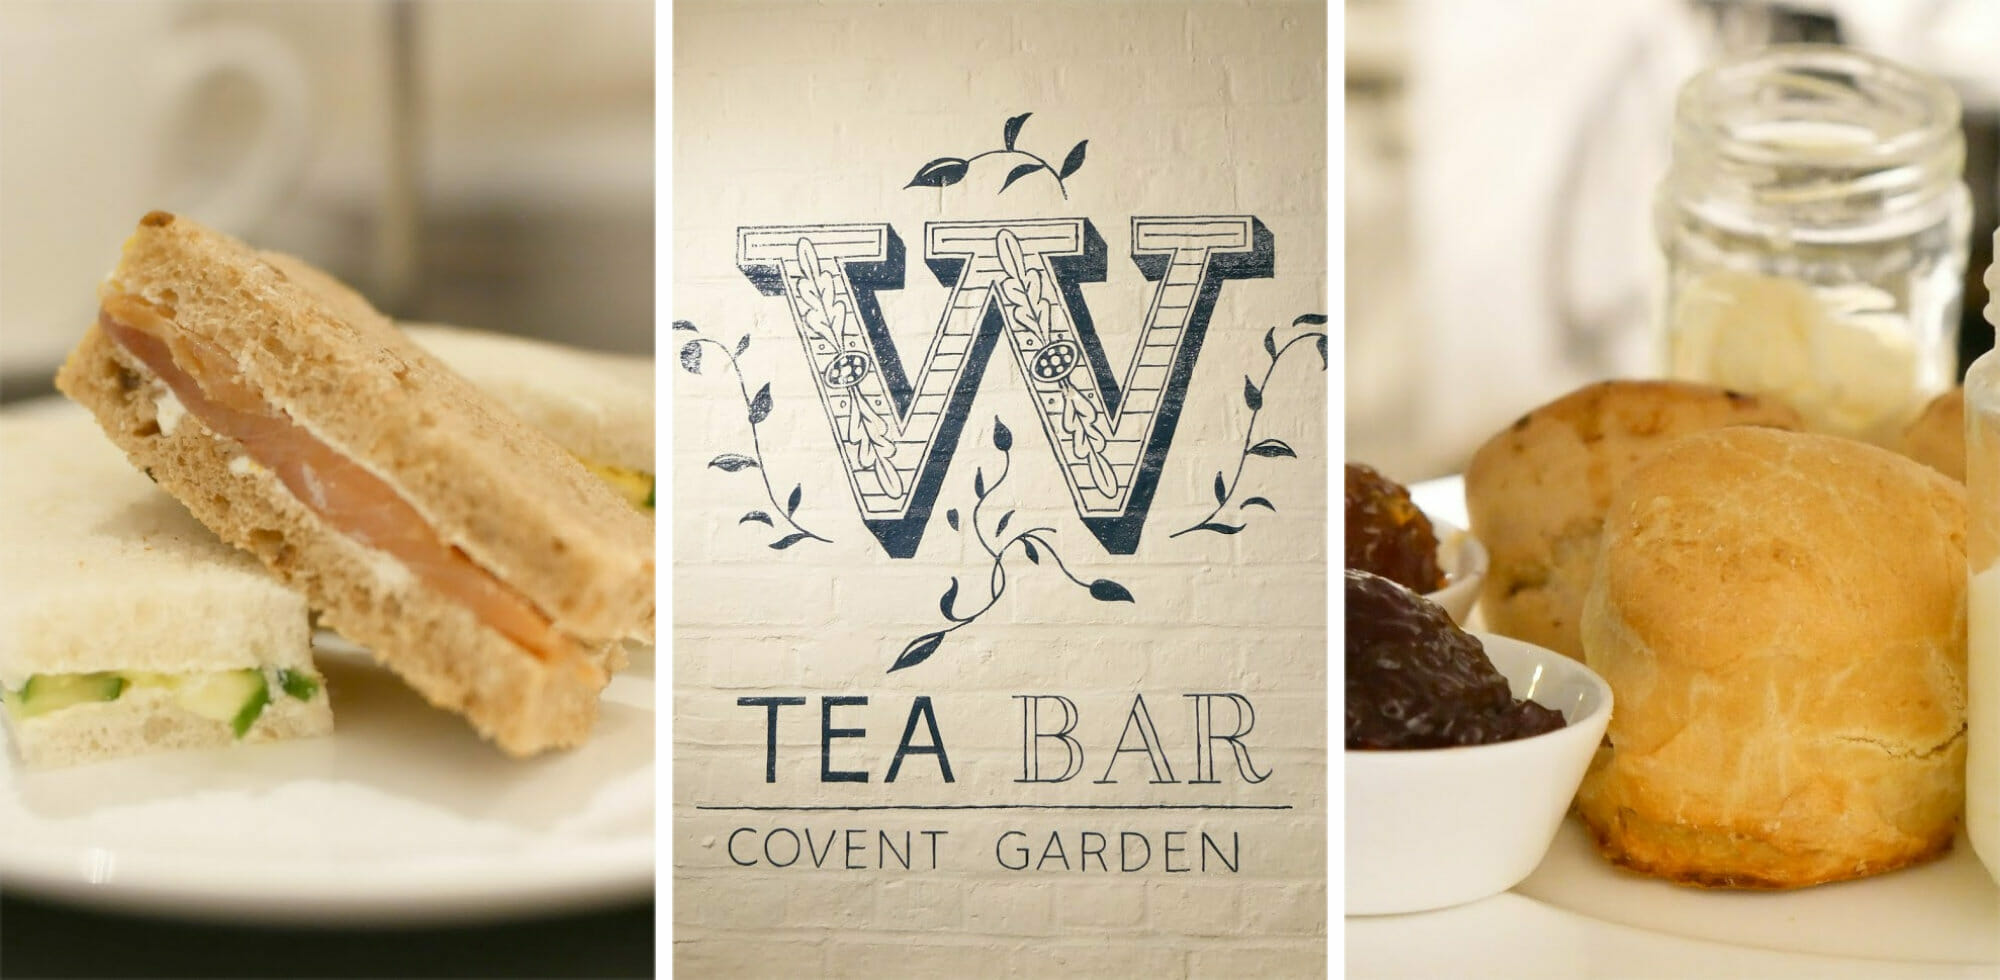 Review: Afternoon Tea at Whittard's Covent Garden Tea Bar via @girlsgonelondon